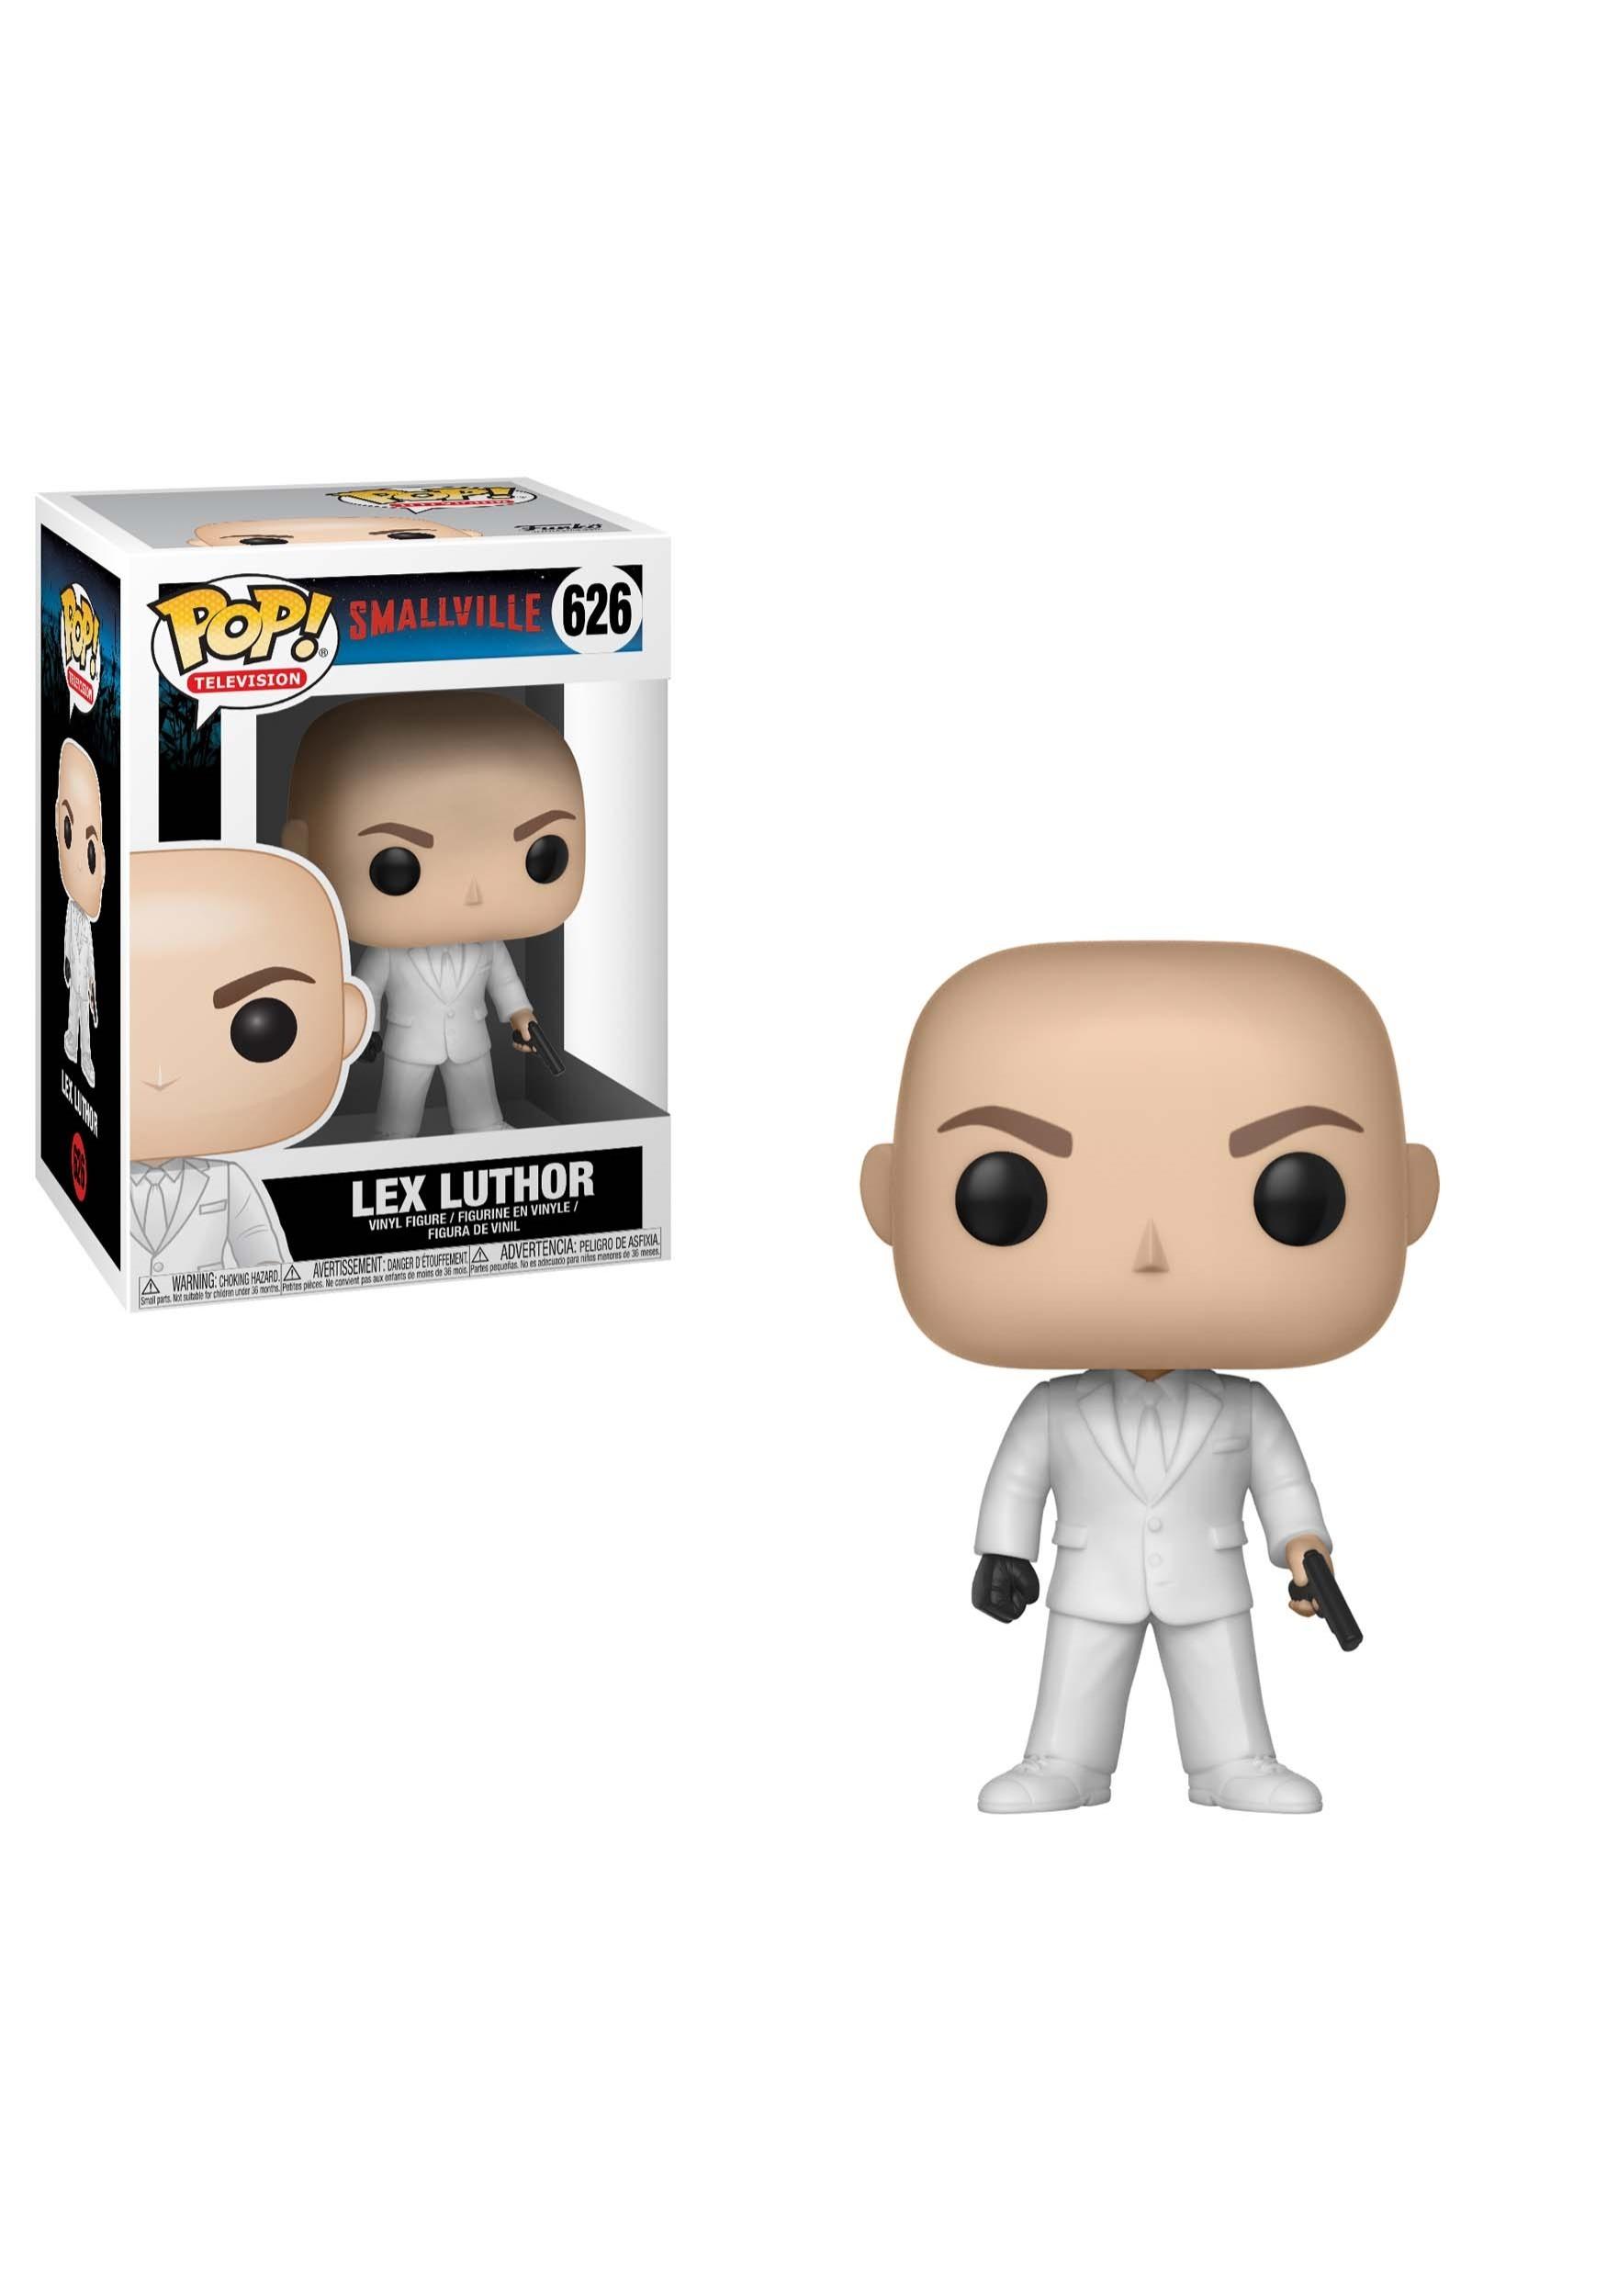 Lex Luthor Funko POP Figur Smallville